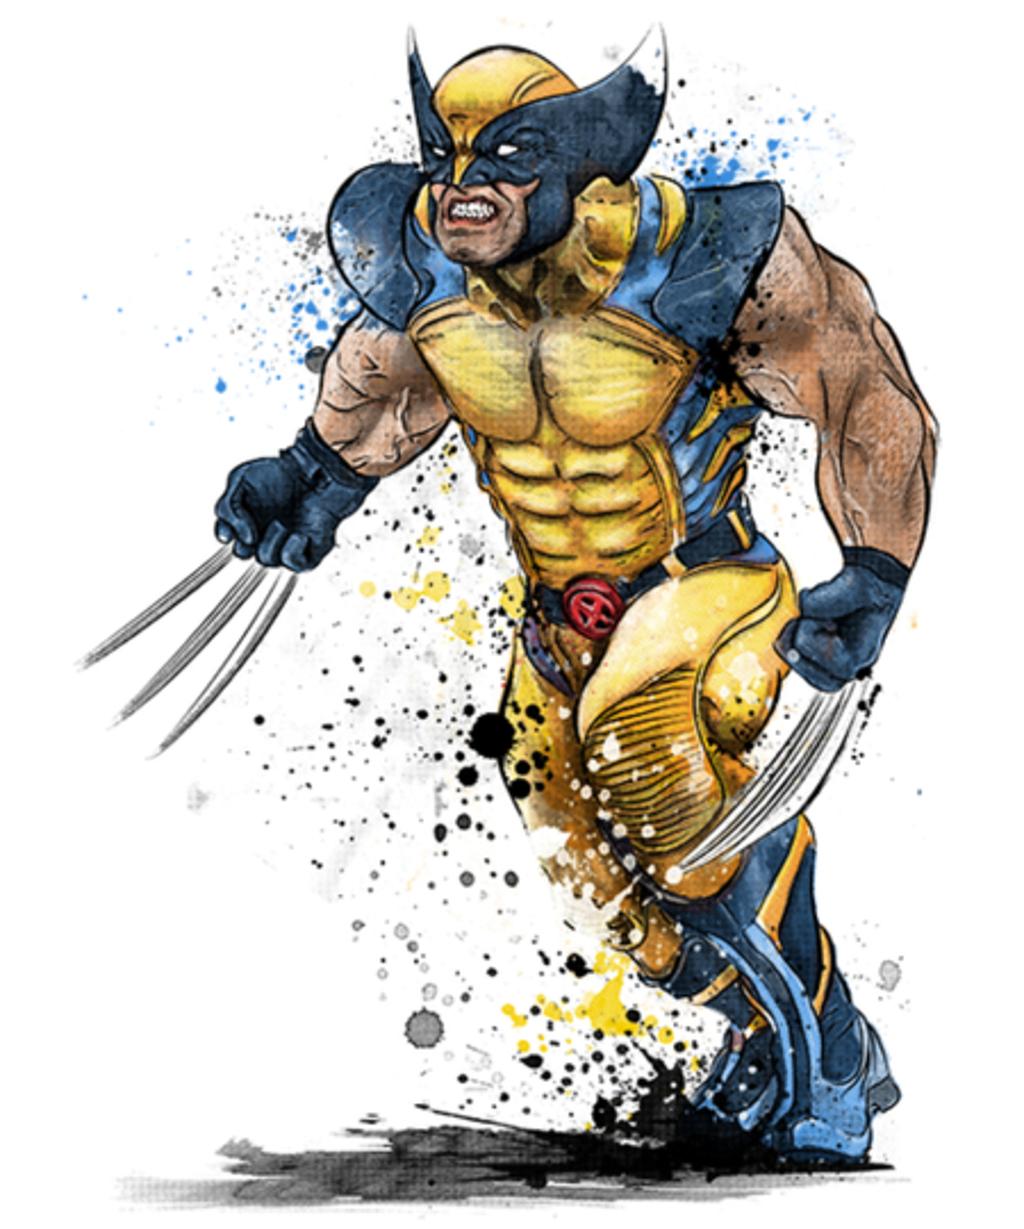 Qwertee: Mutant Rage Watercolor